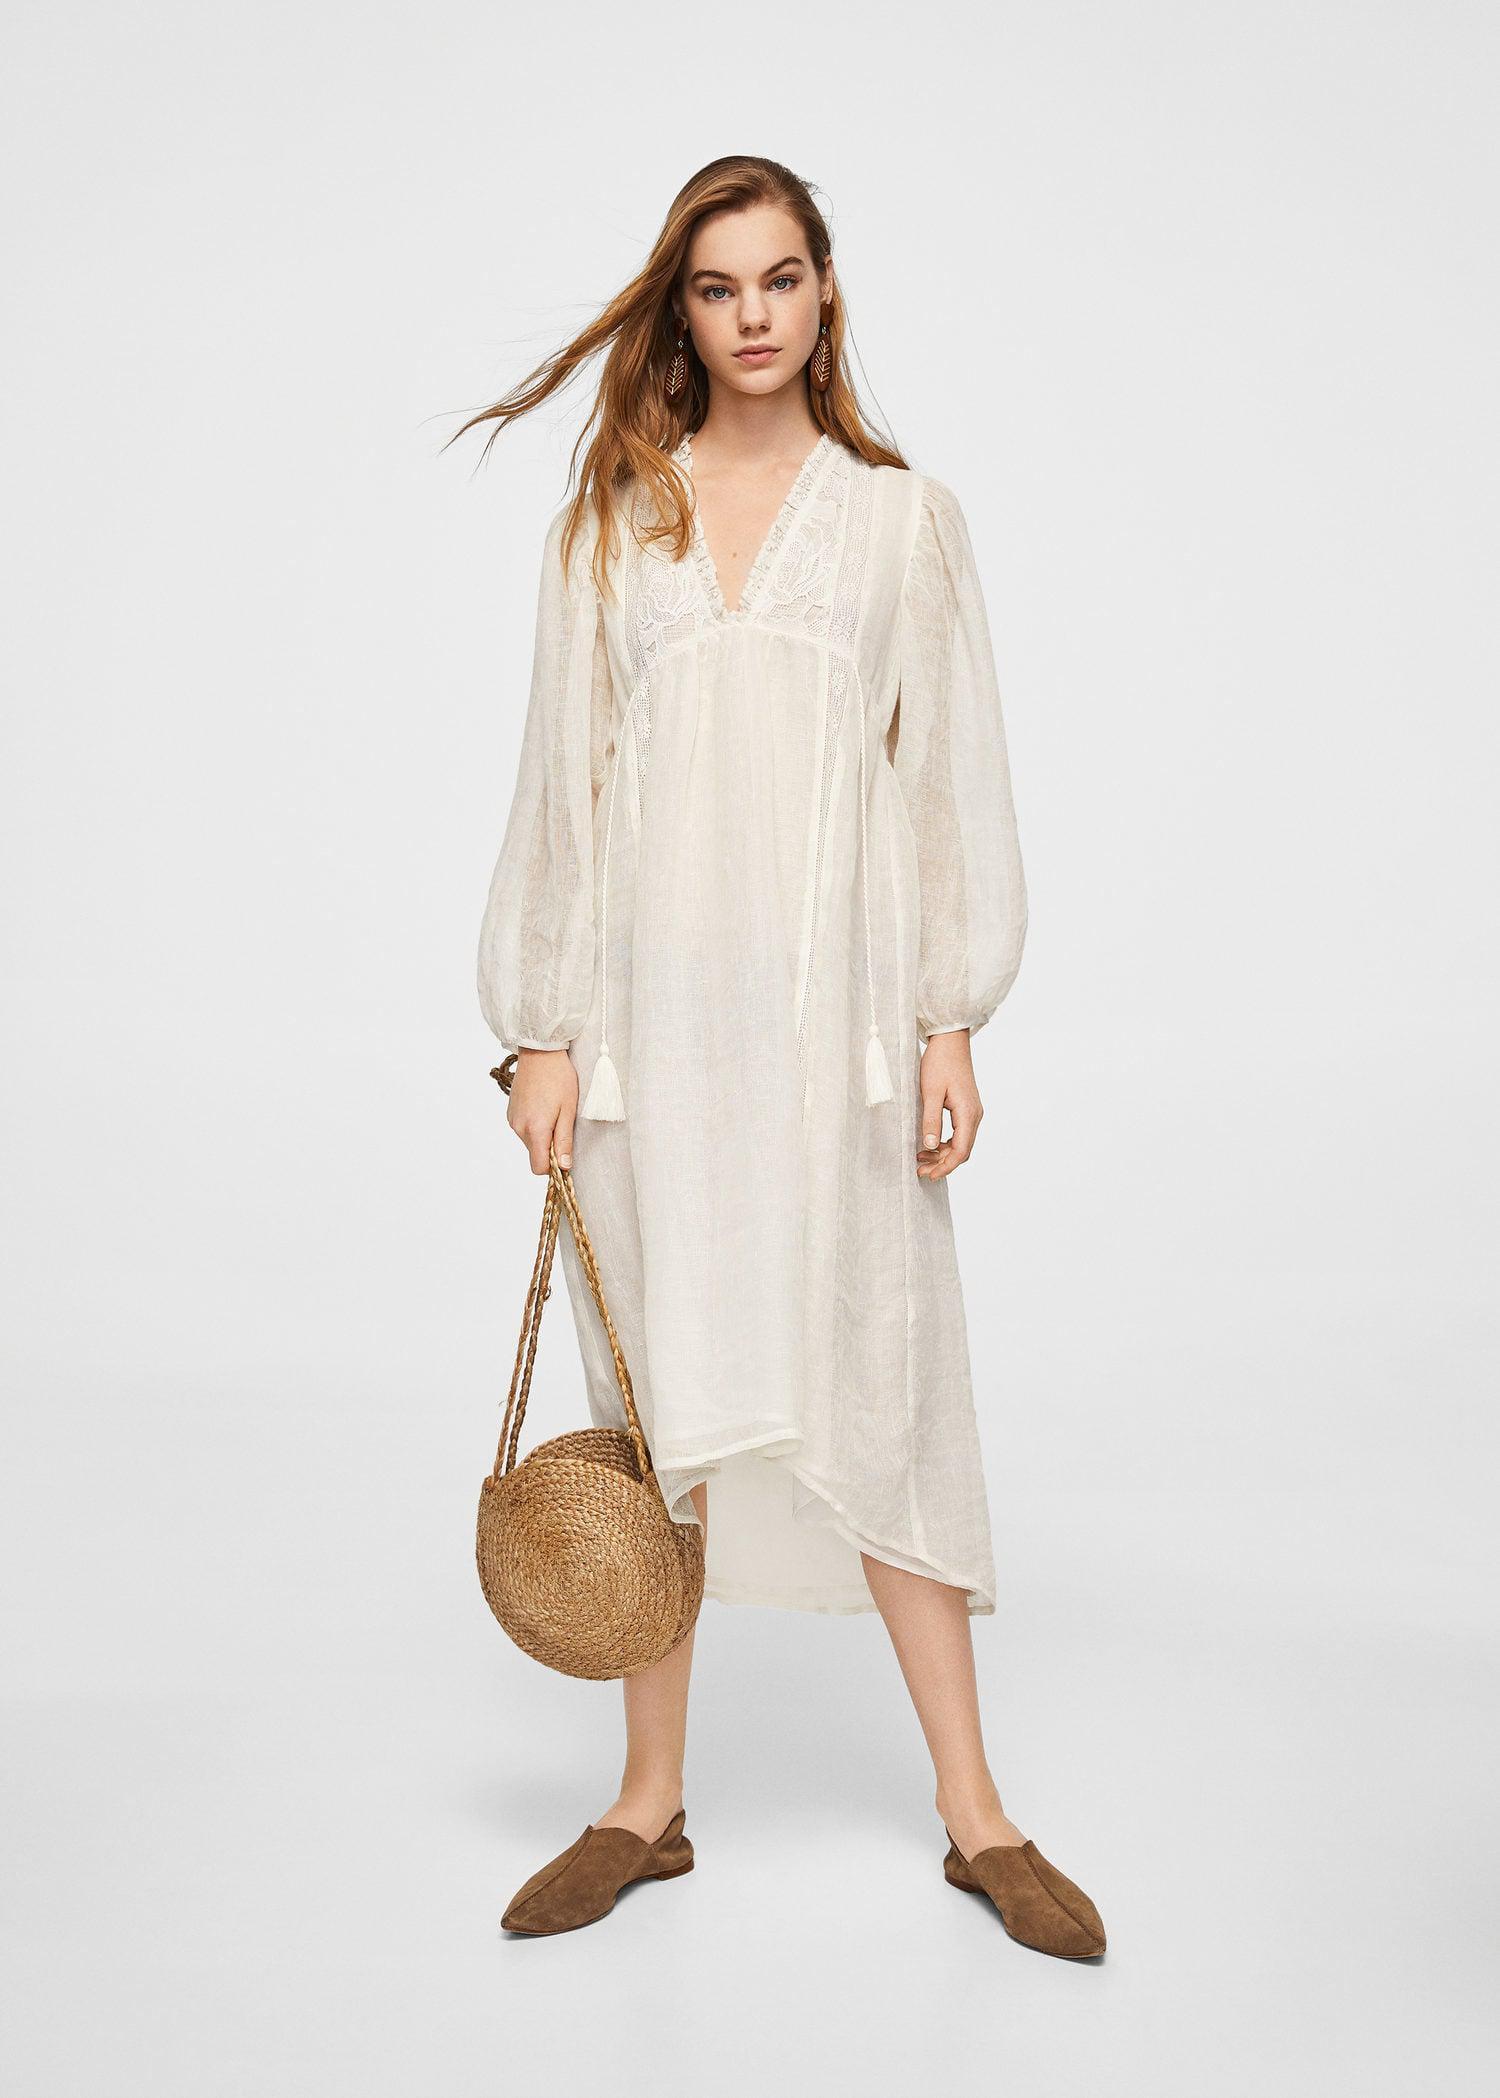 a2126461de Gallery. Women s White Linen Dresses Women s Satin Maxi ...